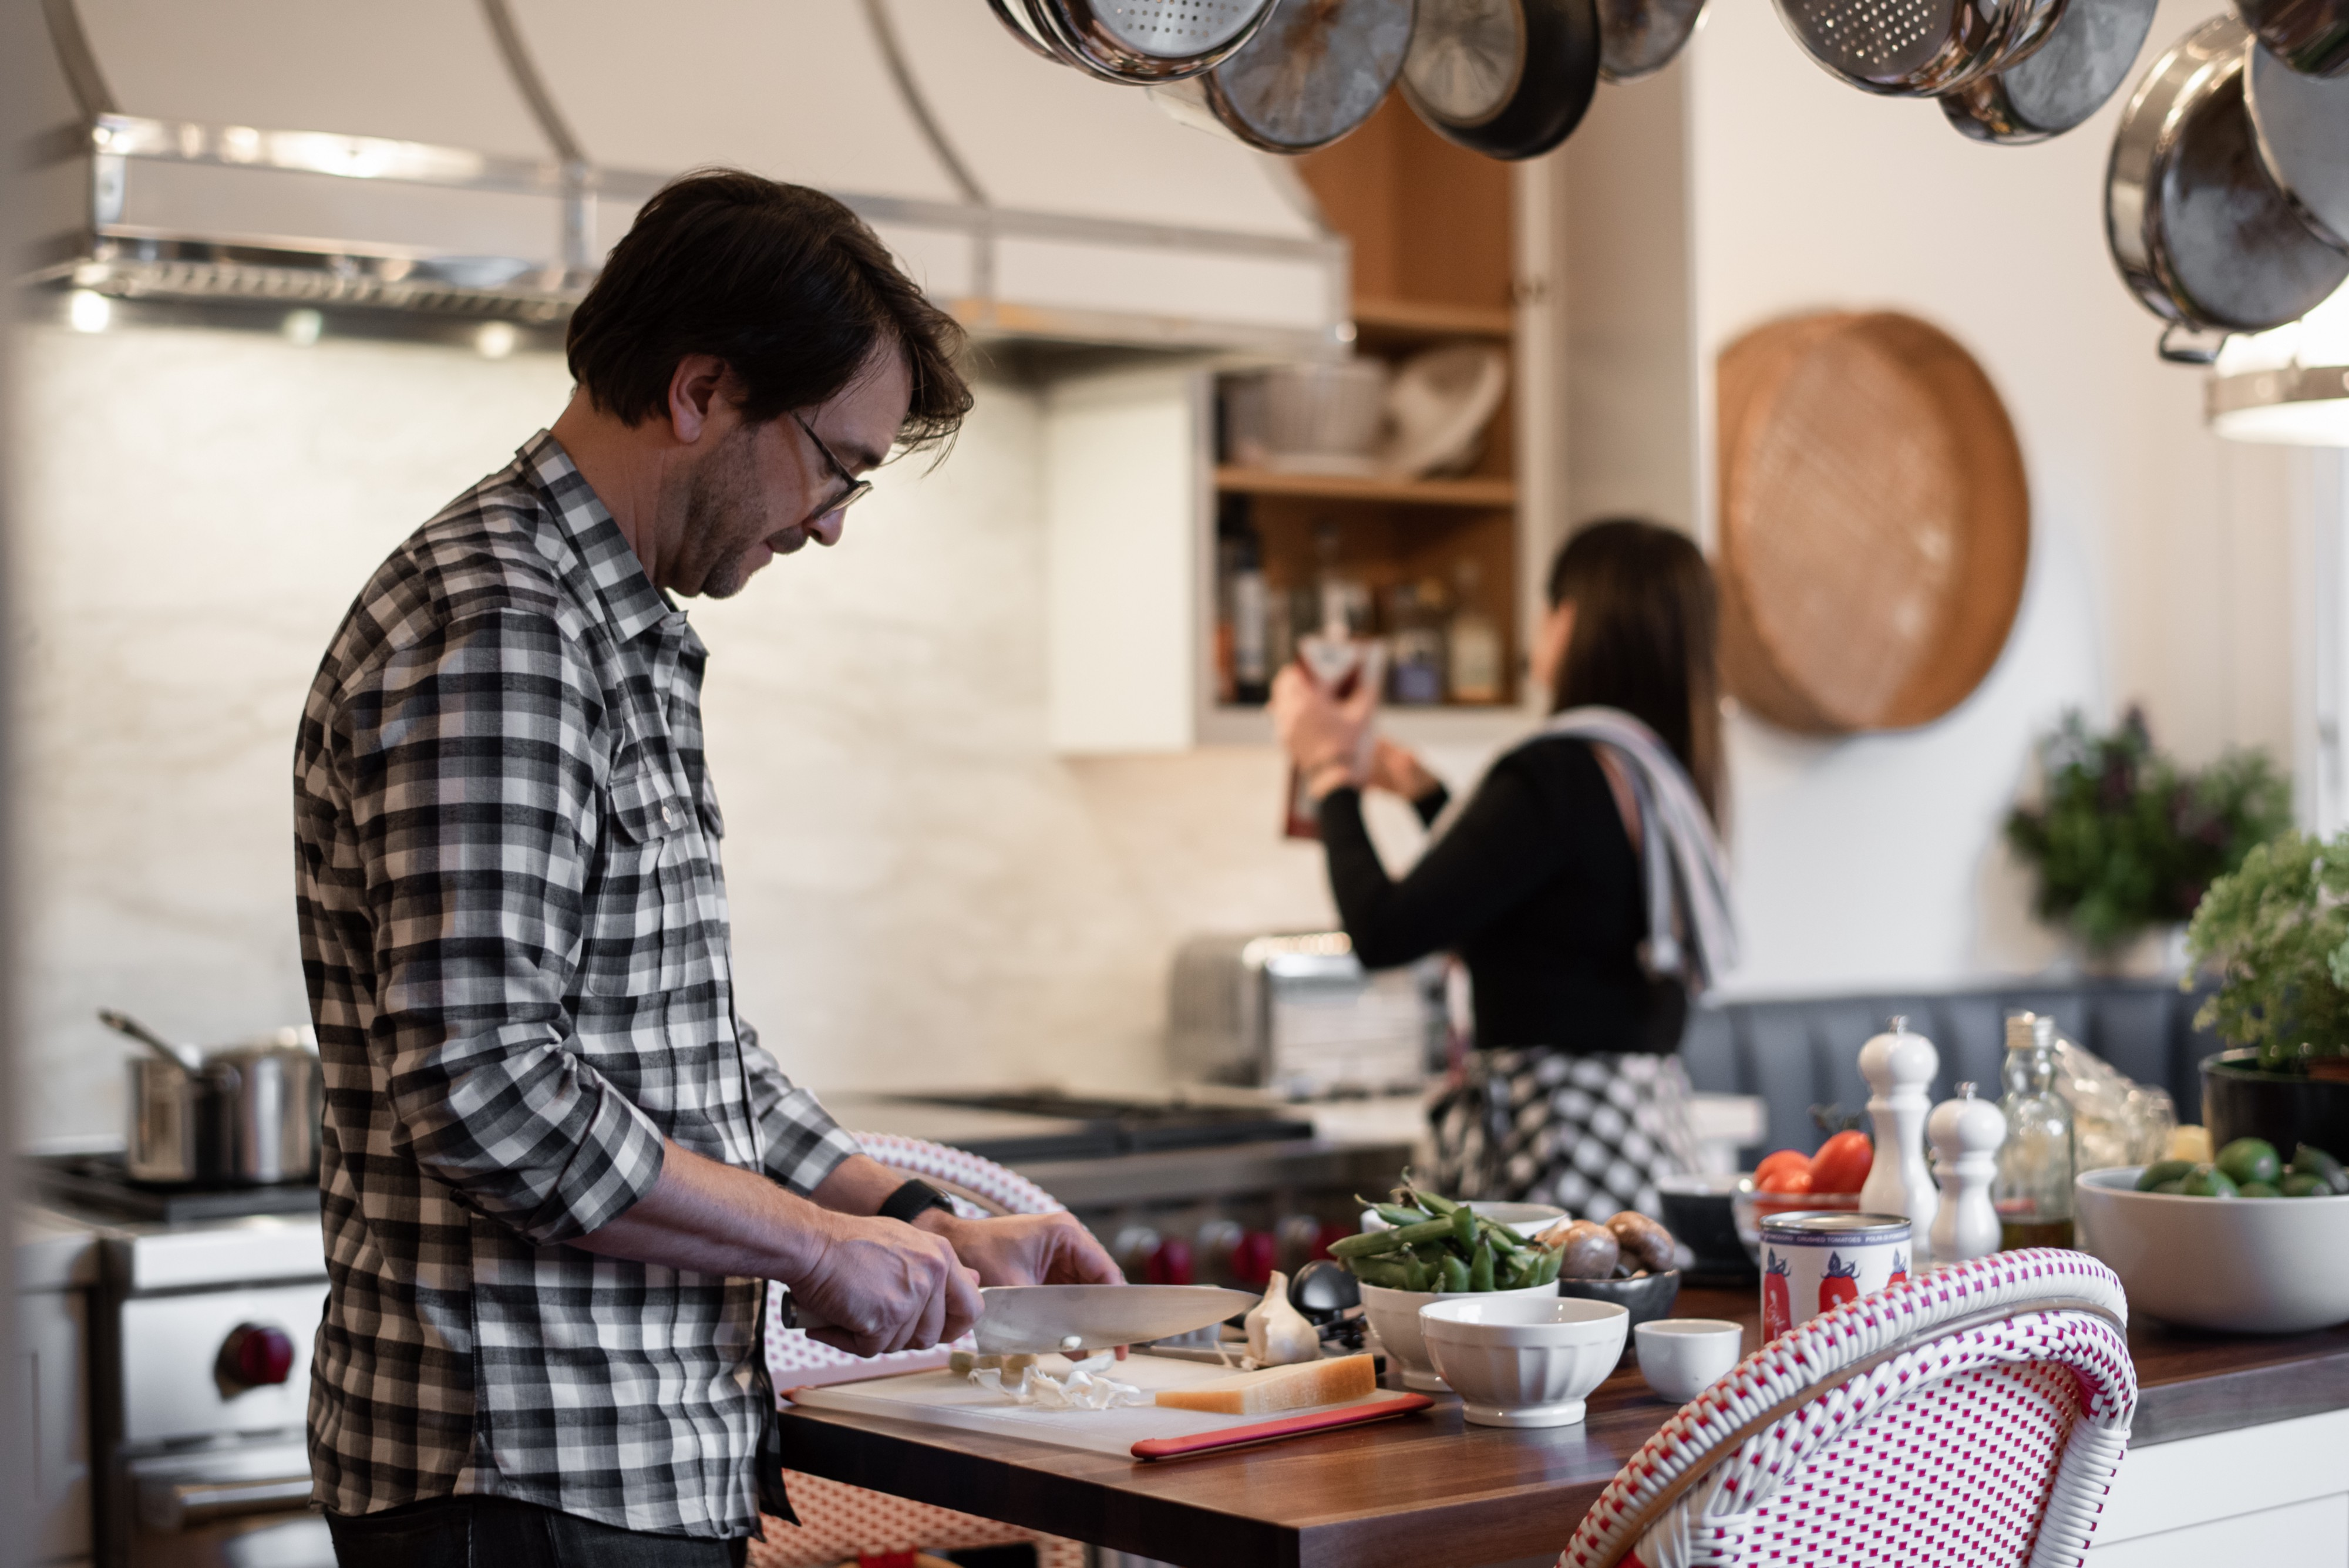 Meal Hero team member chops garlic in a kitchen